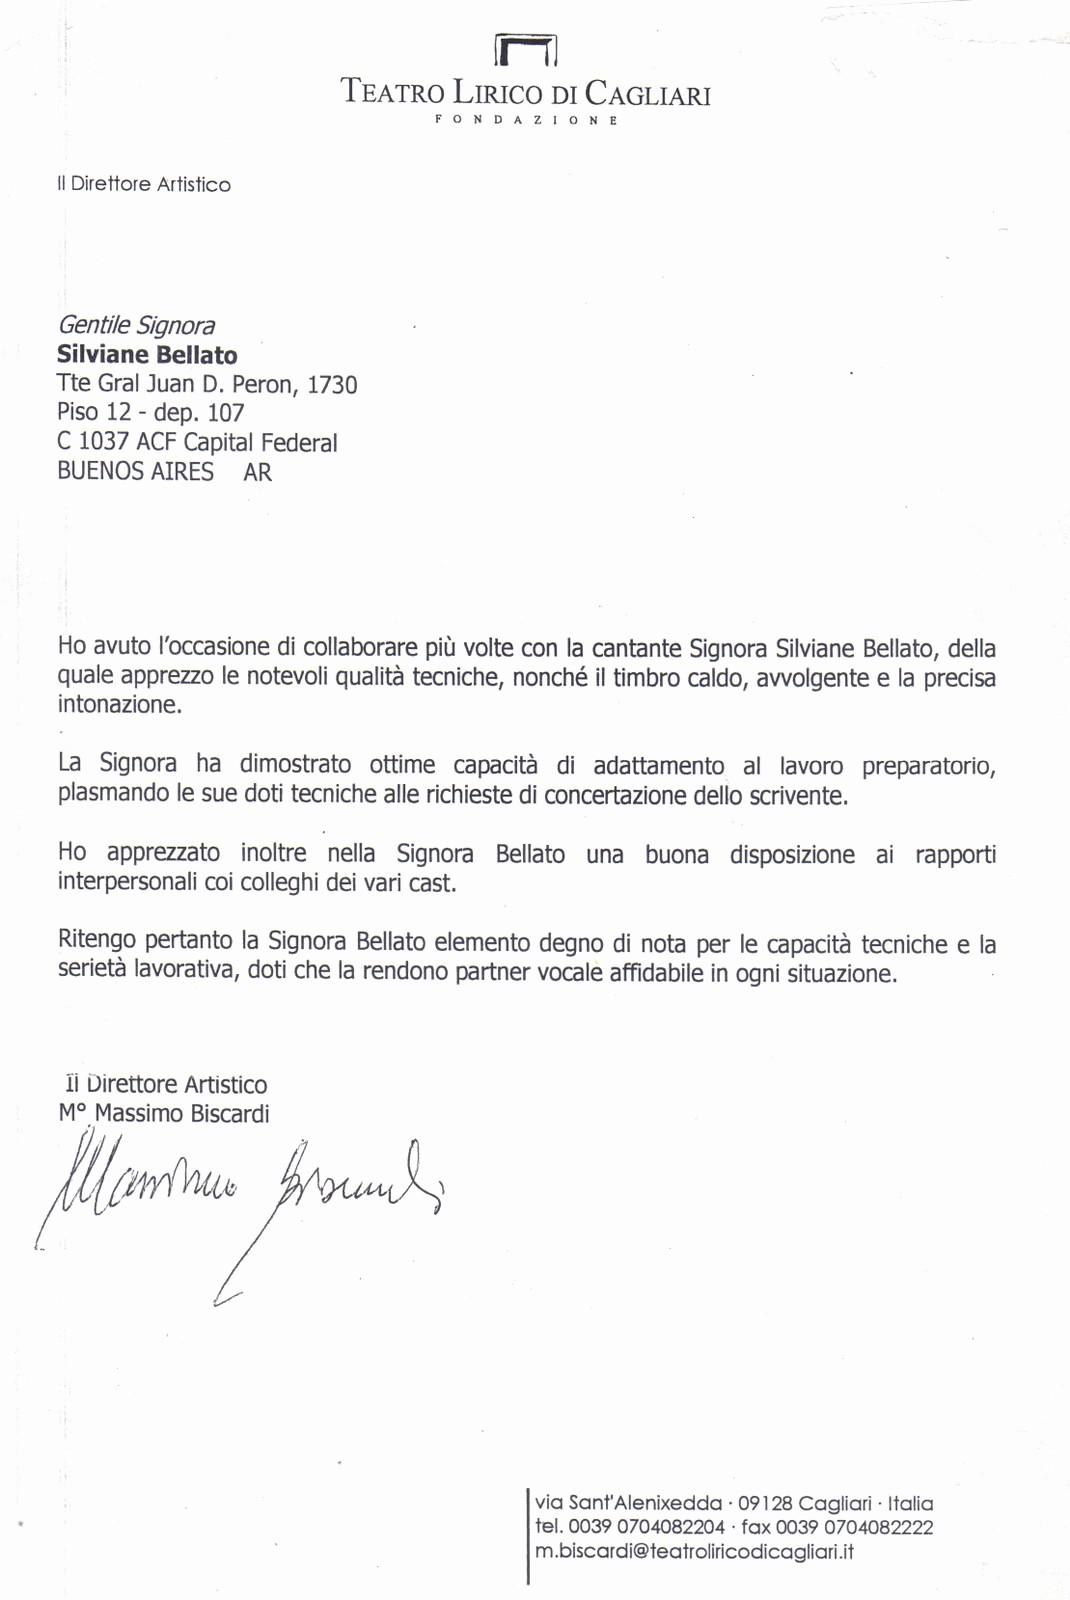 Modelos De Carta De Recomendacao Lovely Silviane Bellato soprano Carta De Re Endação De